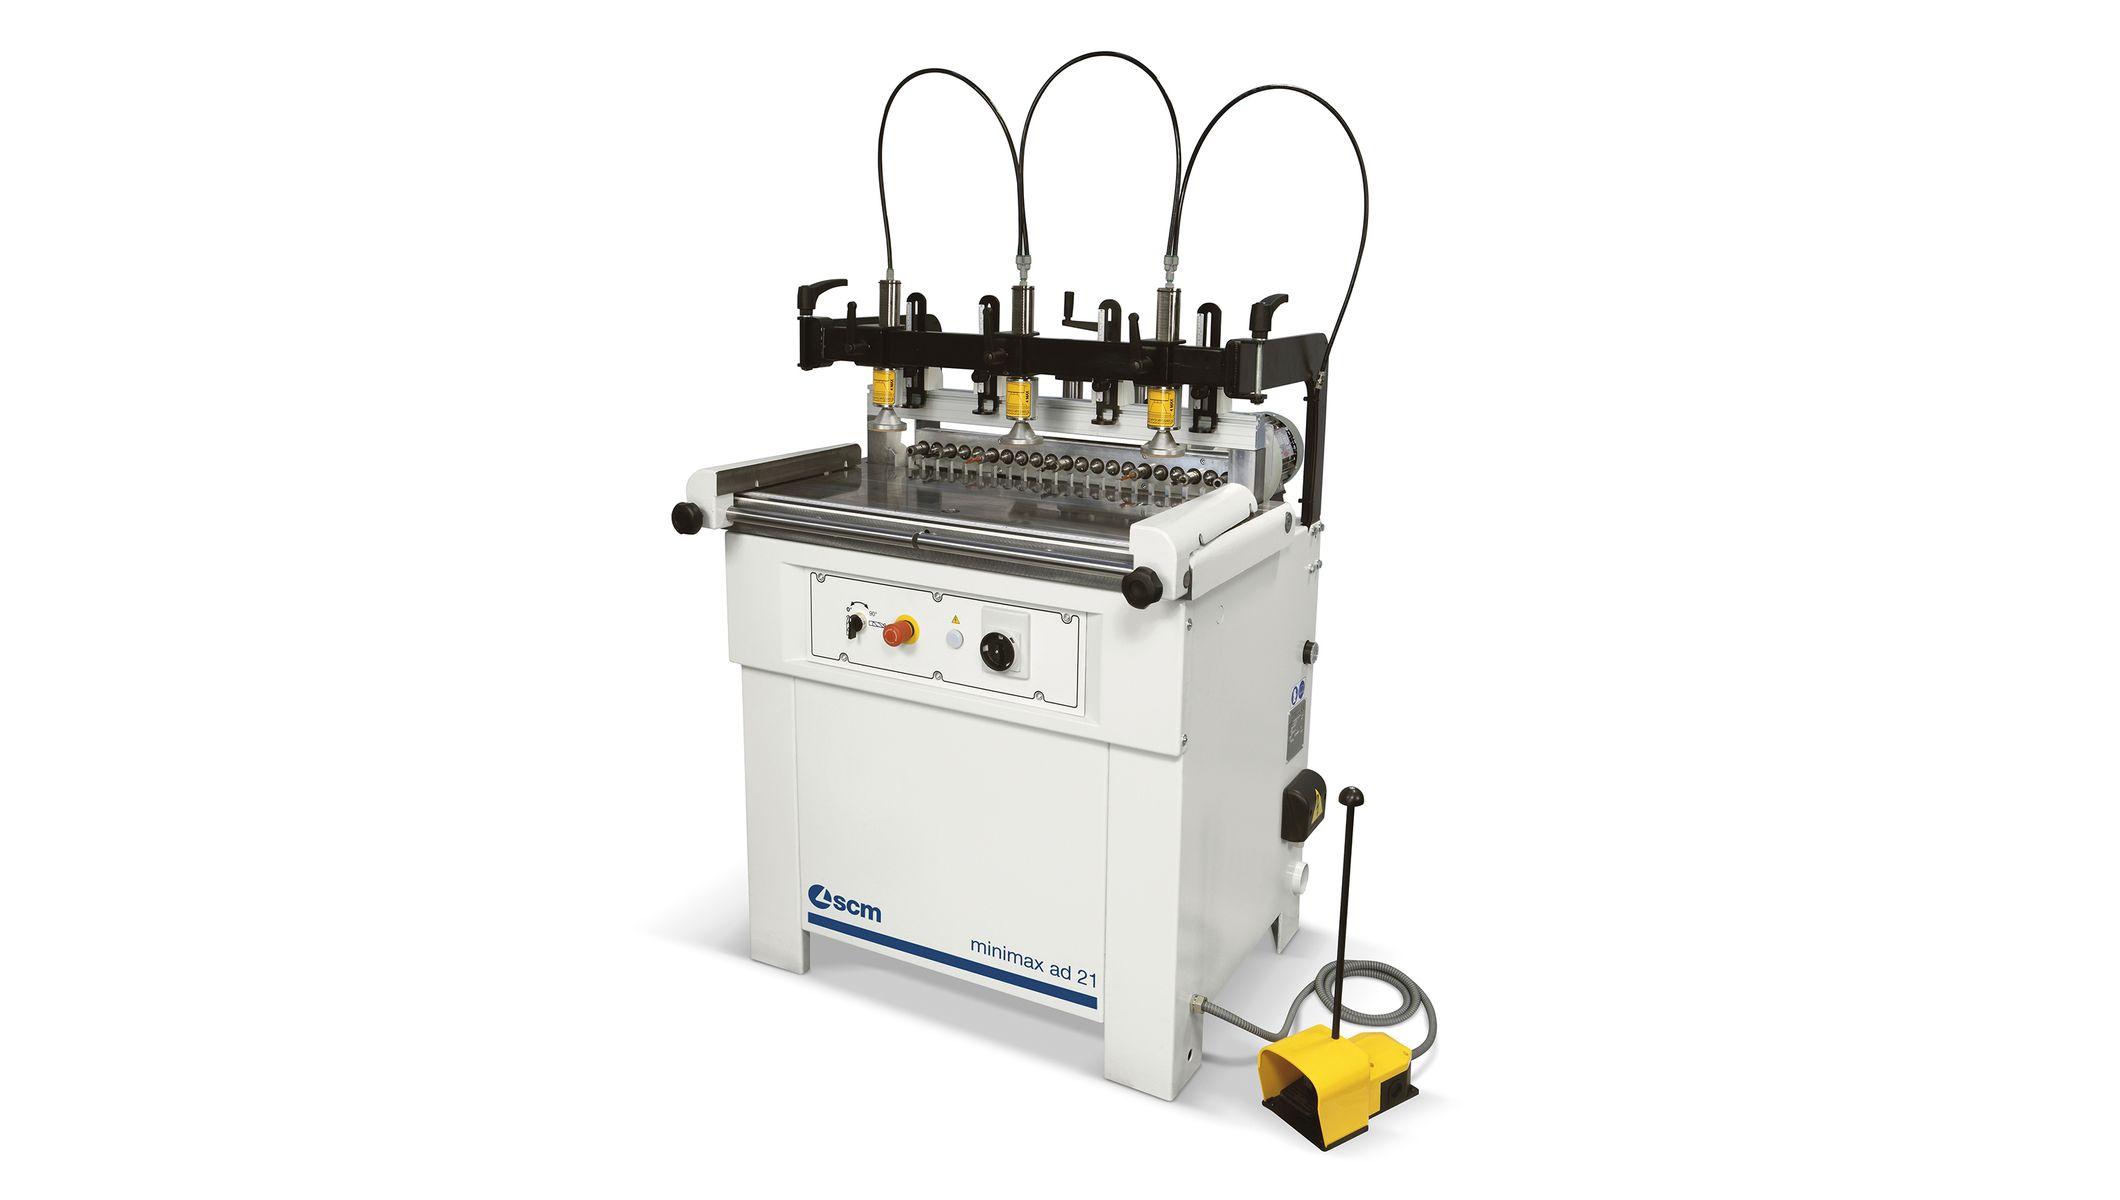 minimax ad 21 boring machine